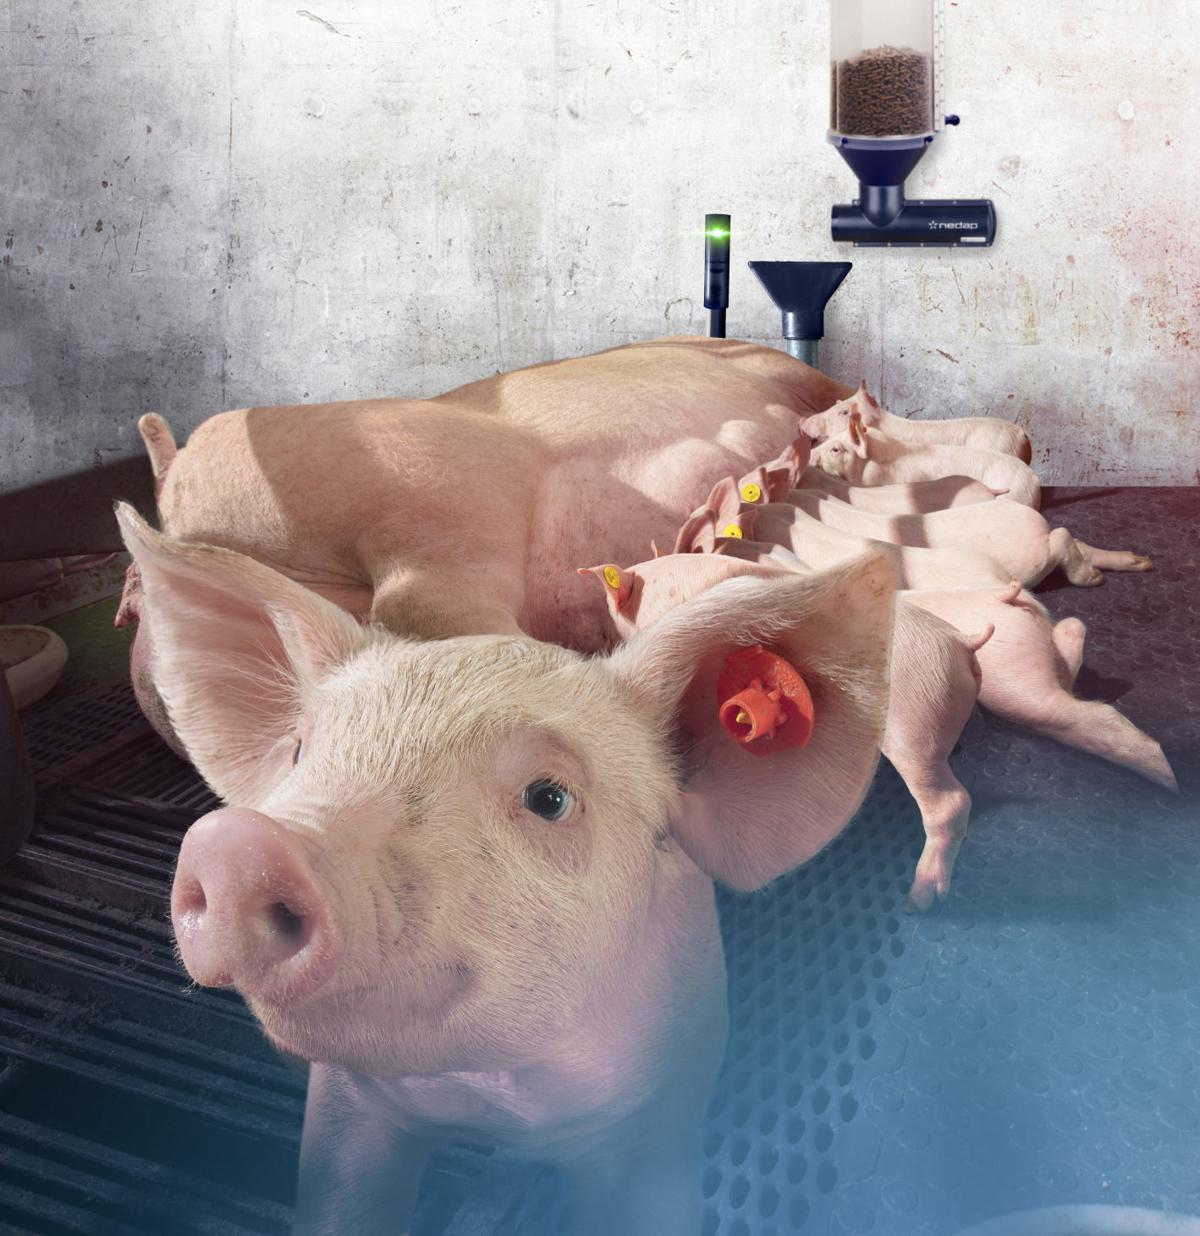 Pigs in camera